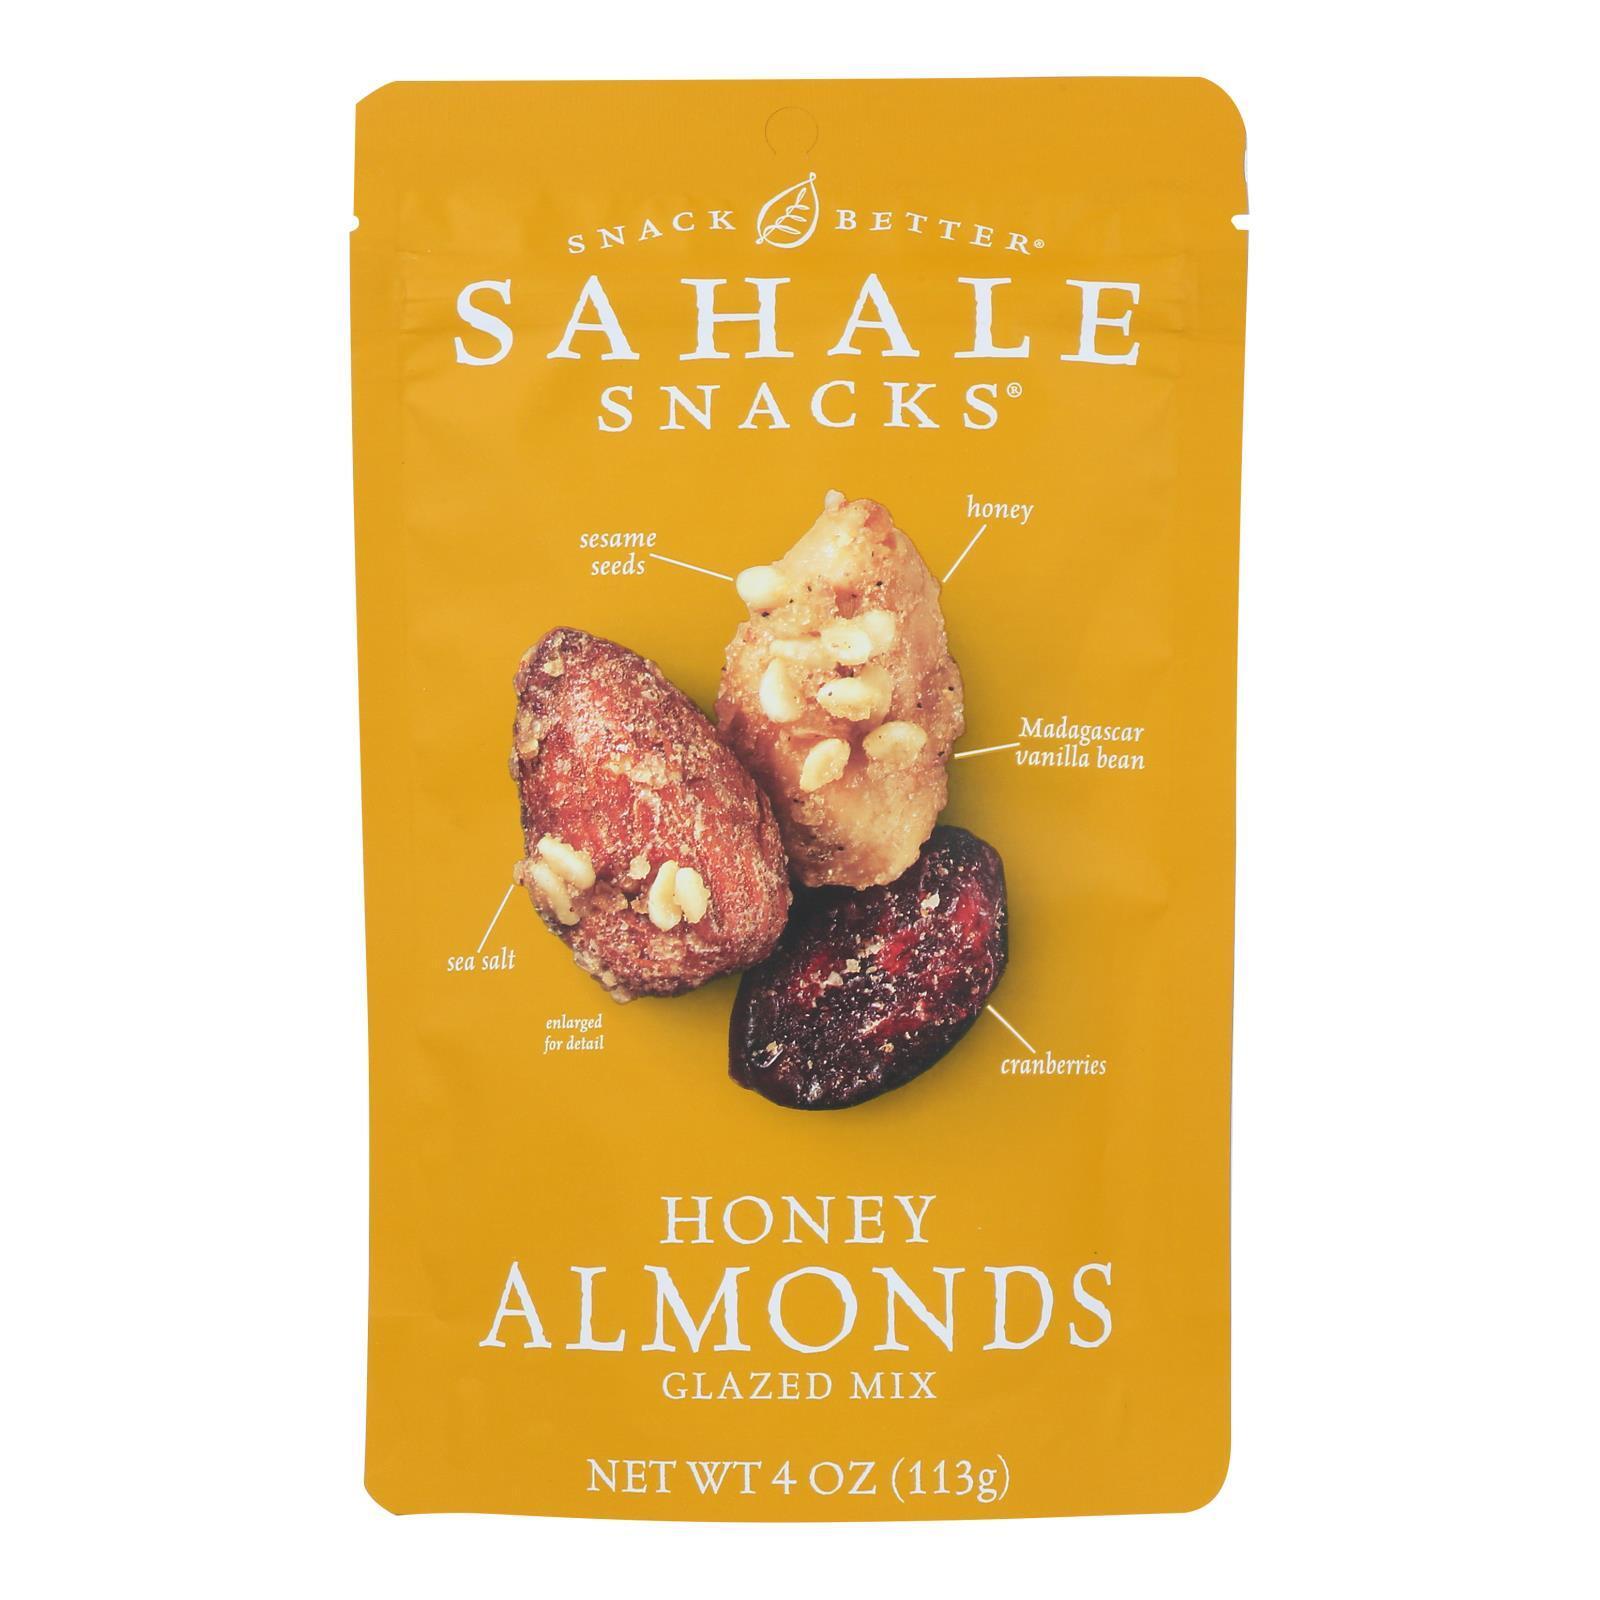 Sahale Snacks Glazed Nuts - Balsamic Almonds - Case of 6 - 4 oz.